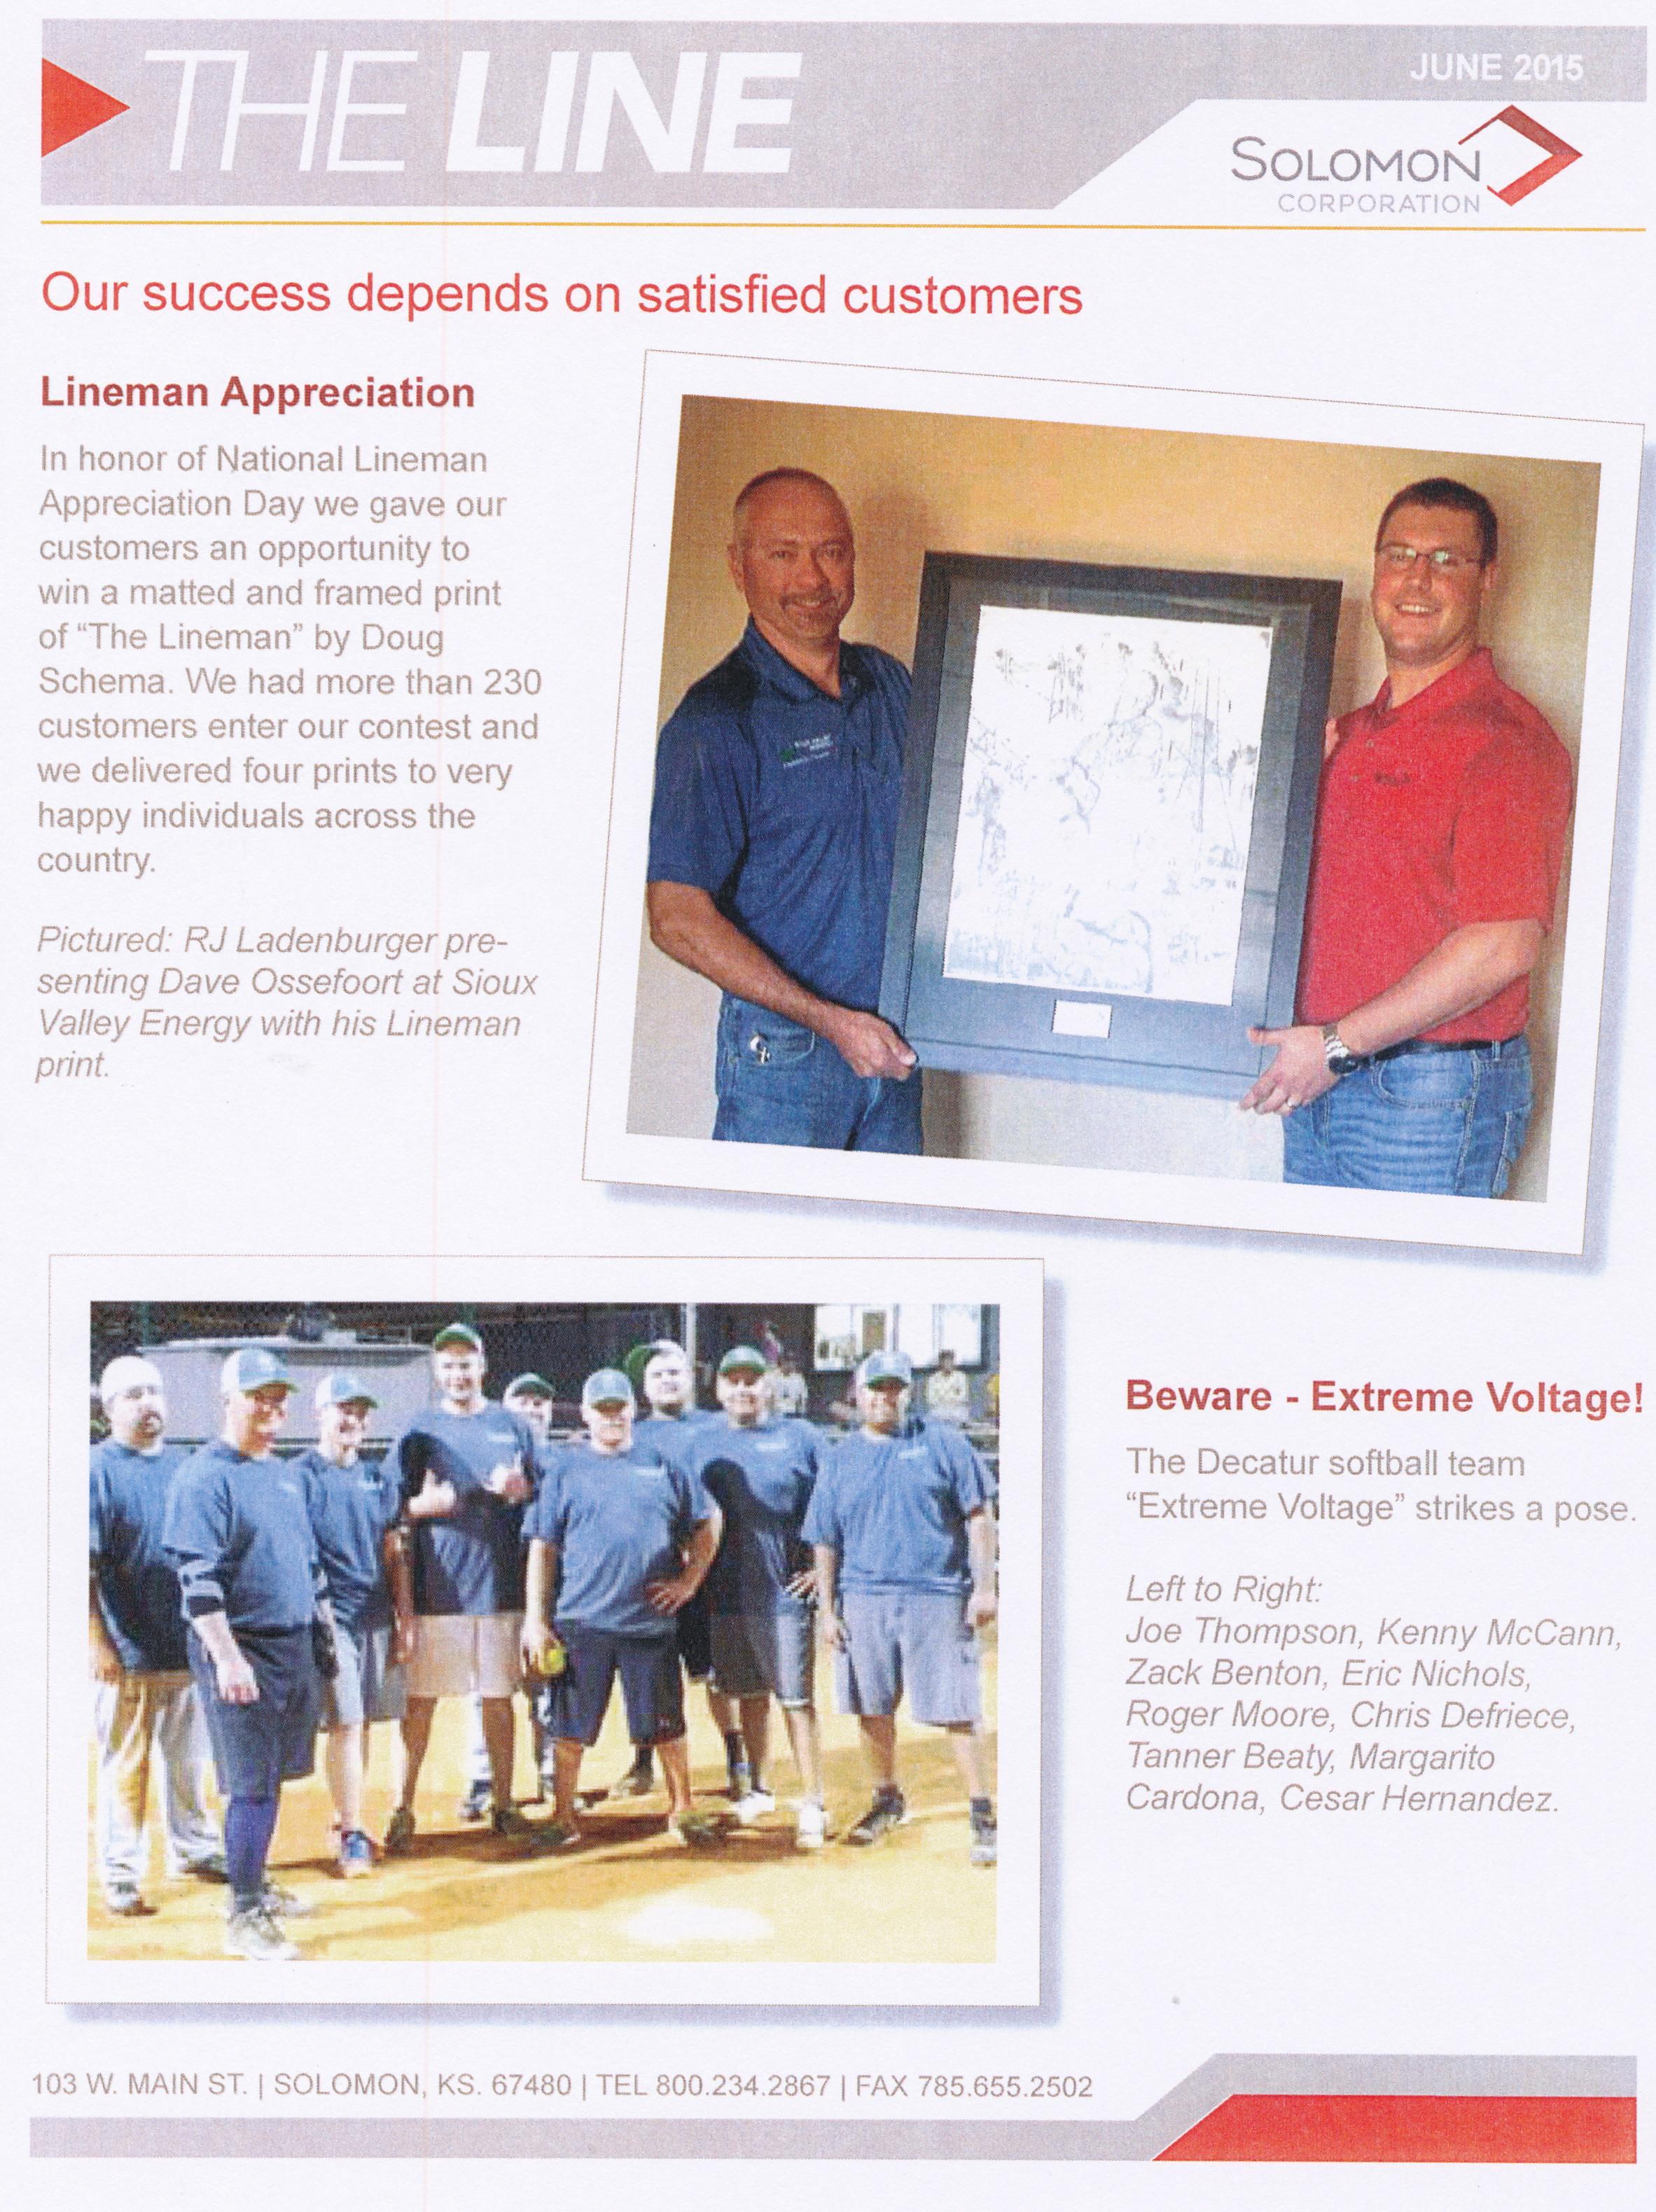 Solomon Contest with The Lineman print 2015